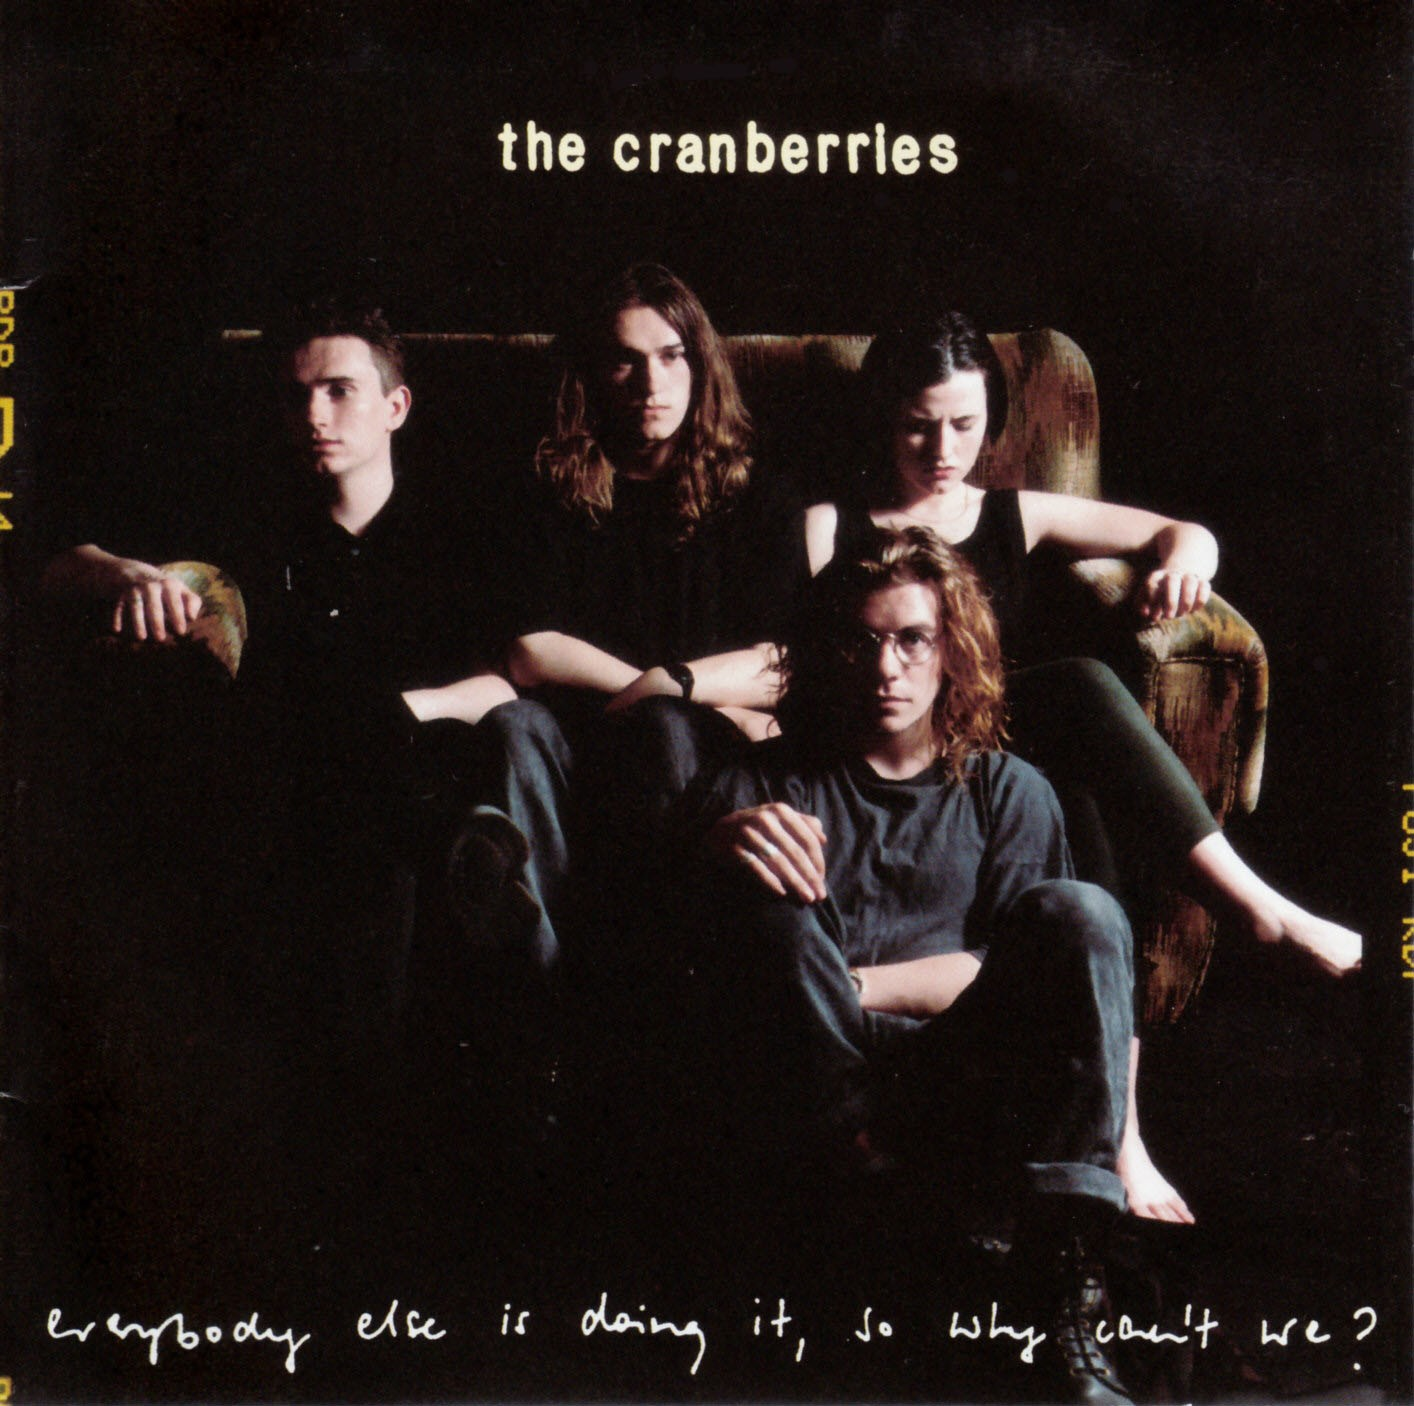 The cranberries icicle melts lyrics